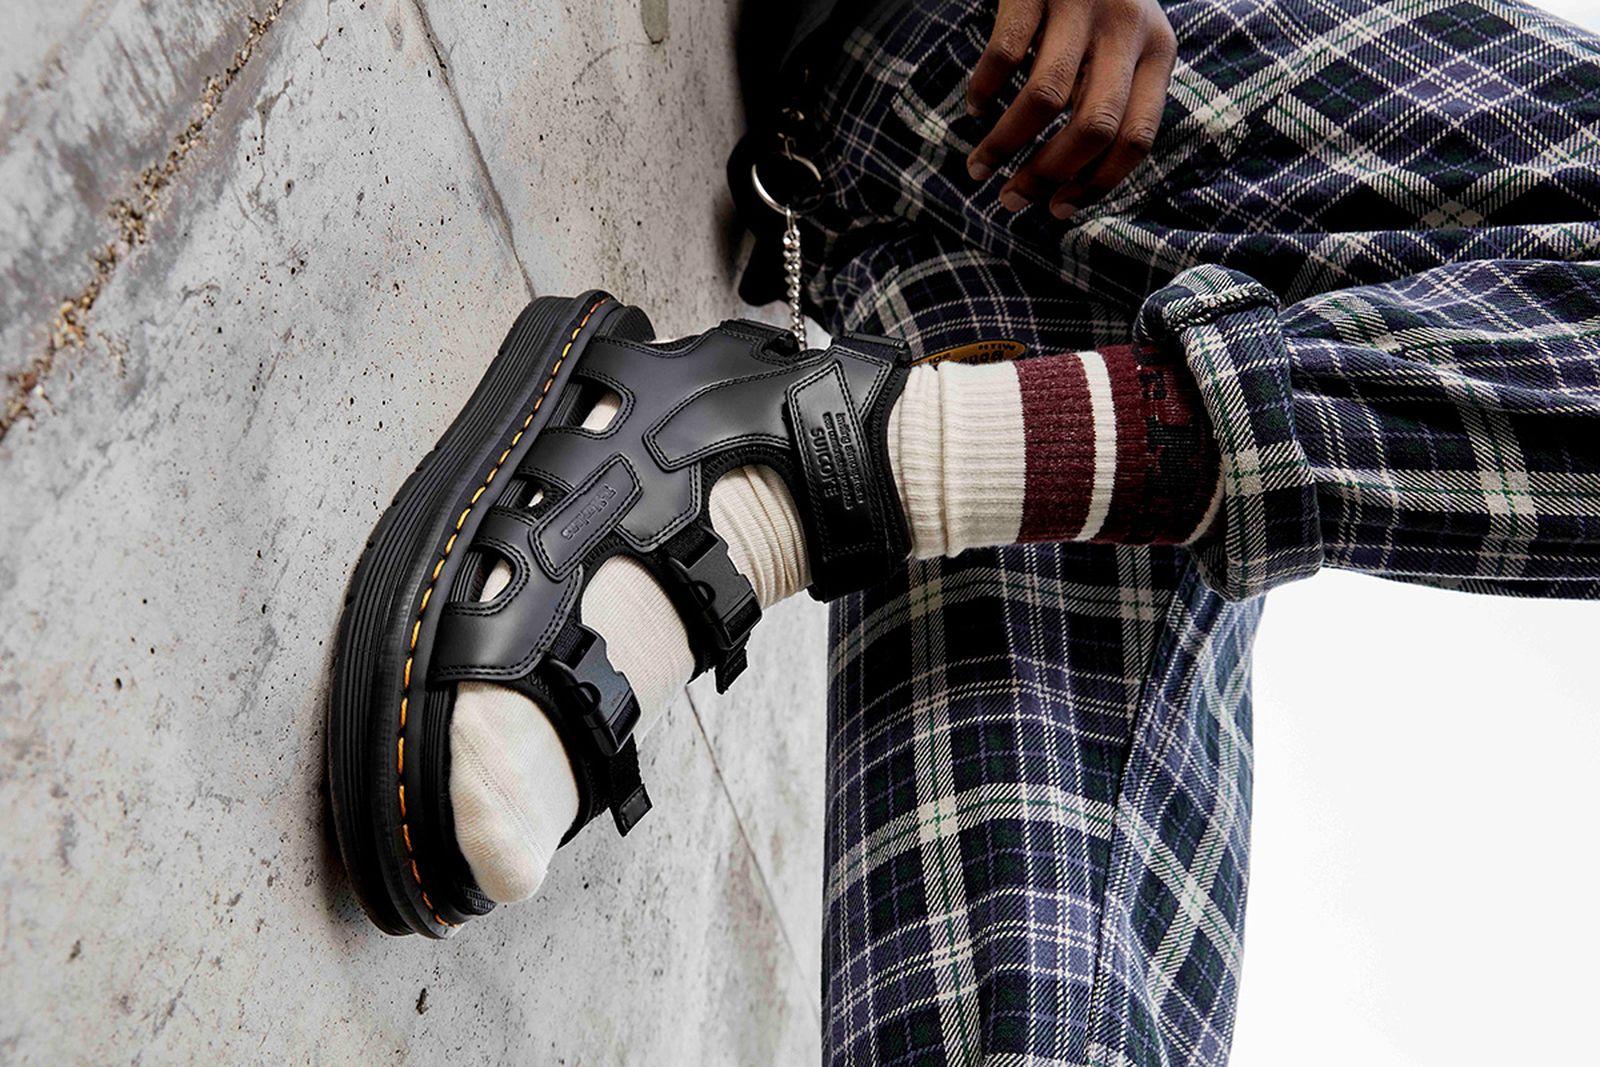 dr-martens-suicoke-sandals-release-date-price-10